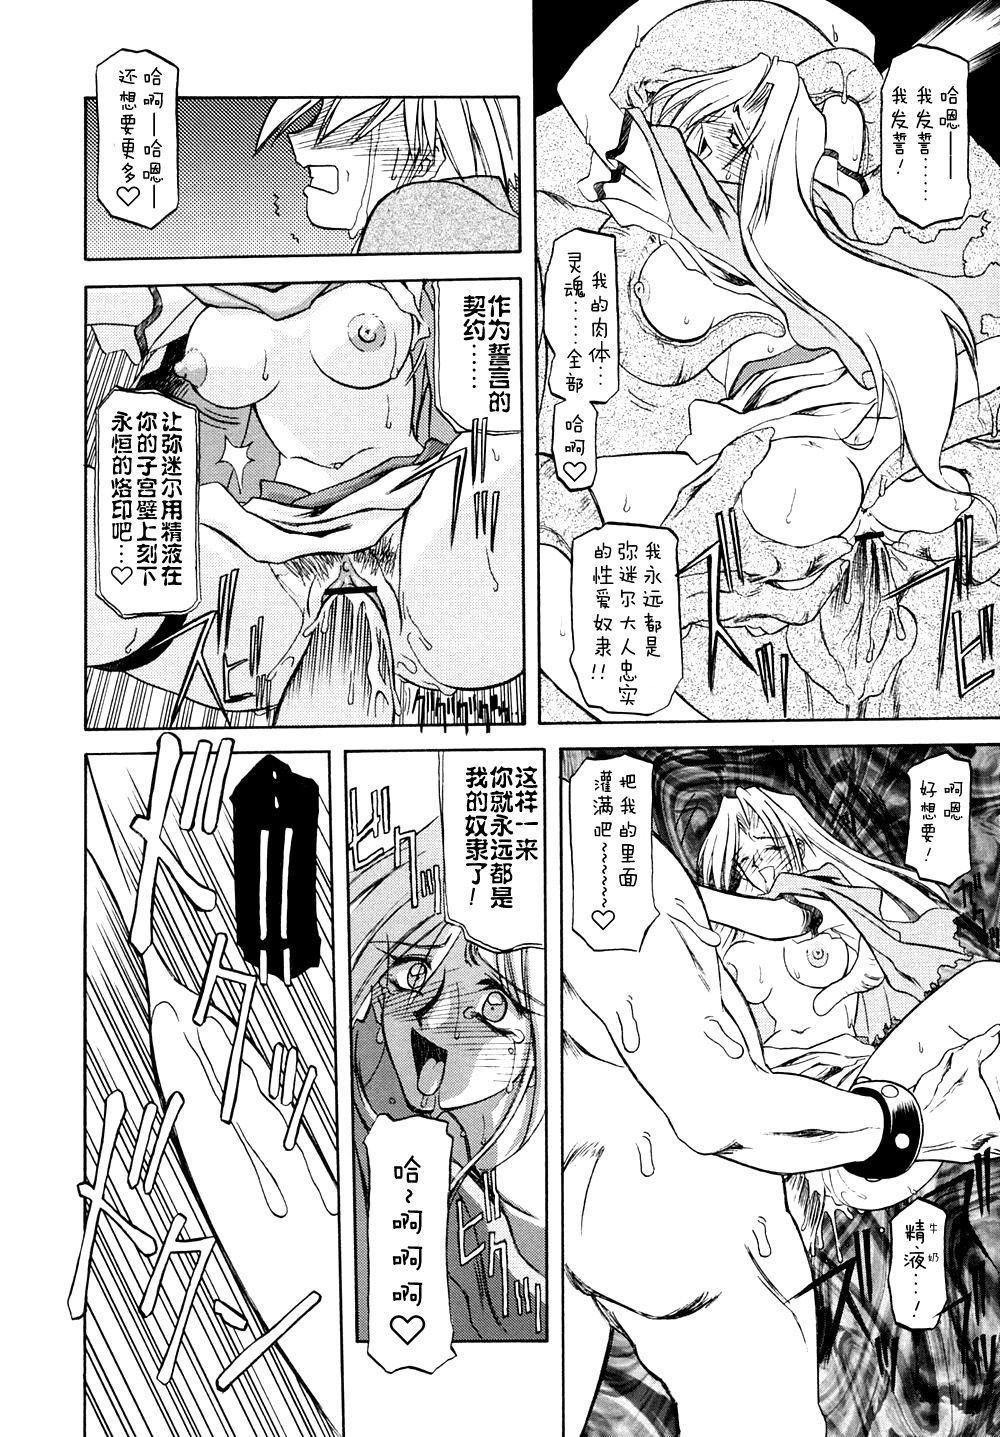 [Sanbun Kyoden] Shichisai no Lamuros | The Lamuros of Seven Colors [Chinese] ep.1 36